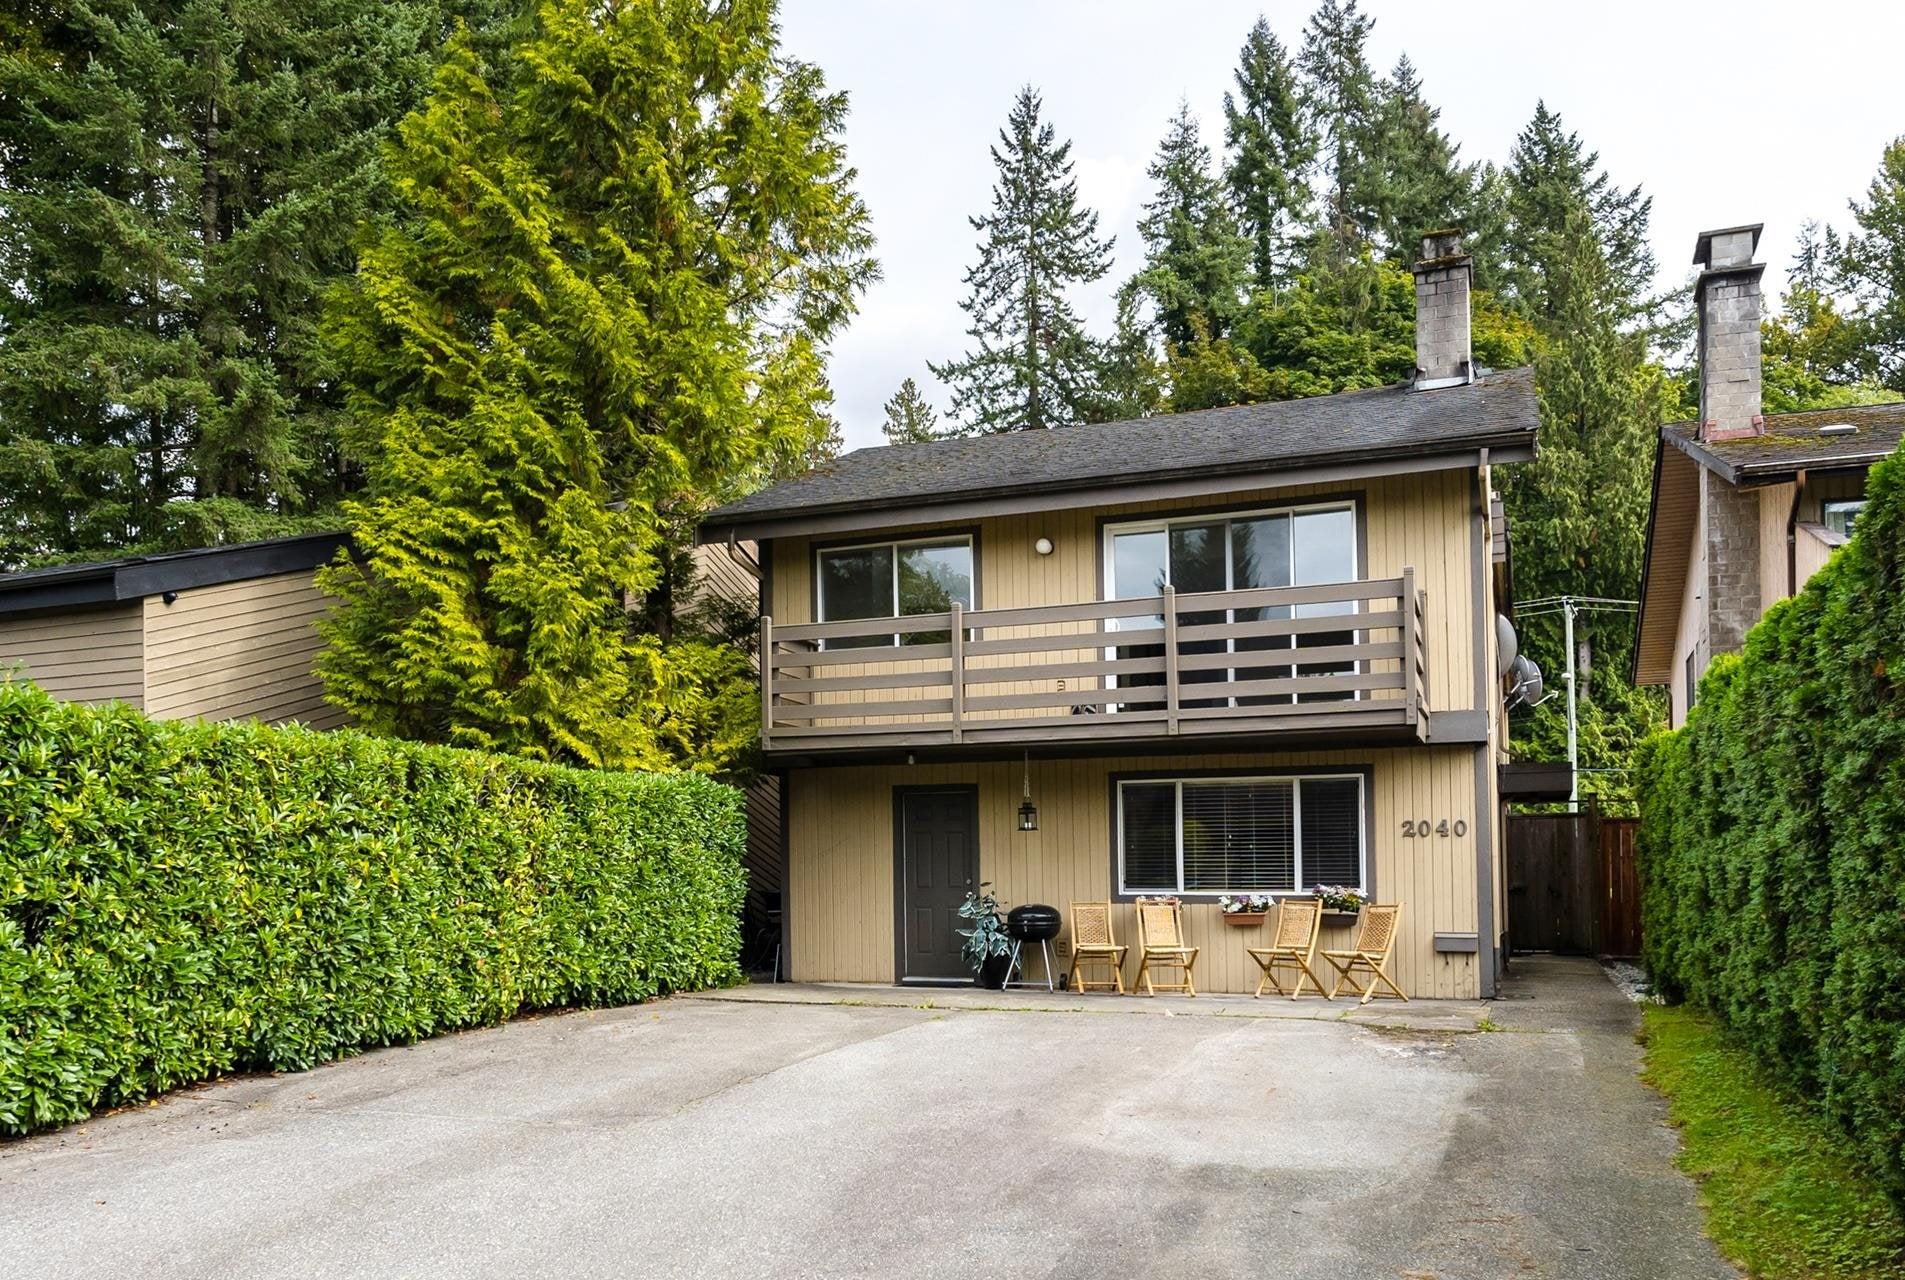 2040 SANDOWN PLACE - Pemberton NV House/Single Family for sale, 5 Bedrooms (R2620576) - #1